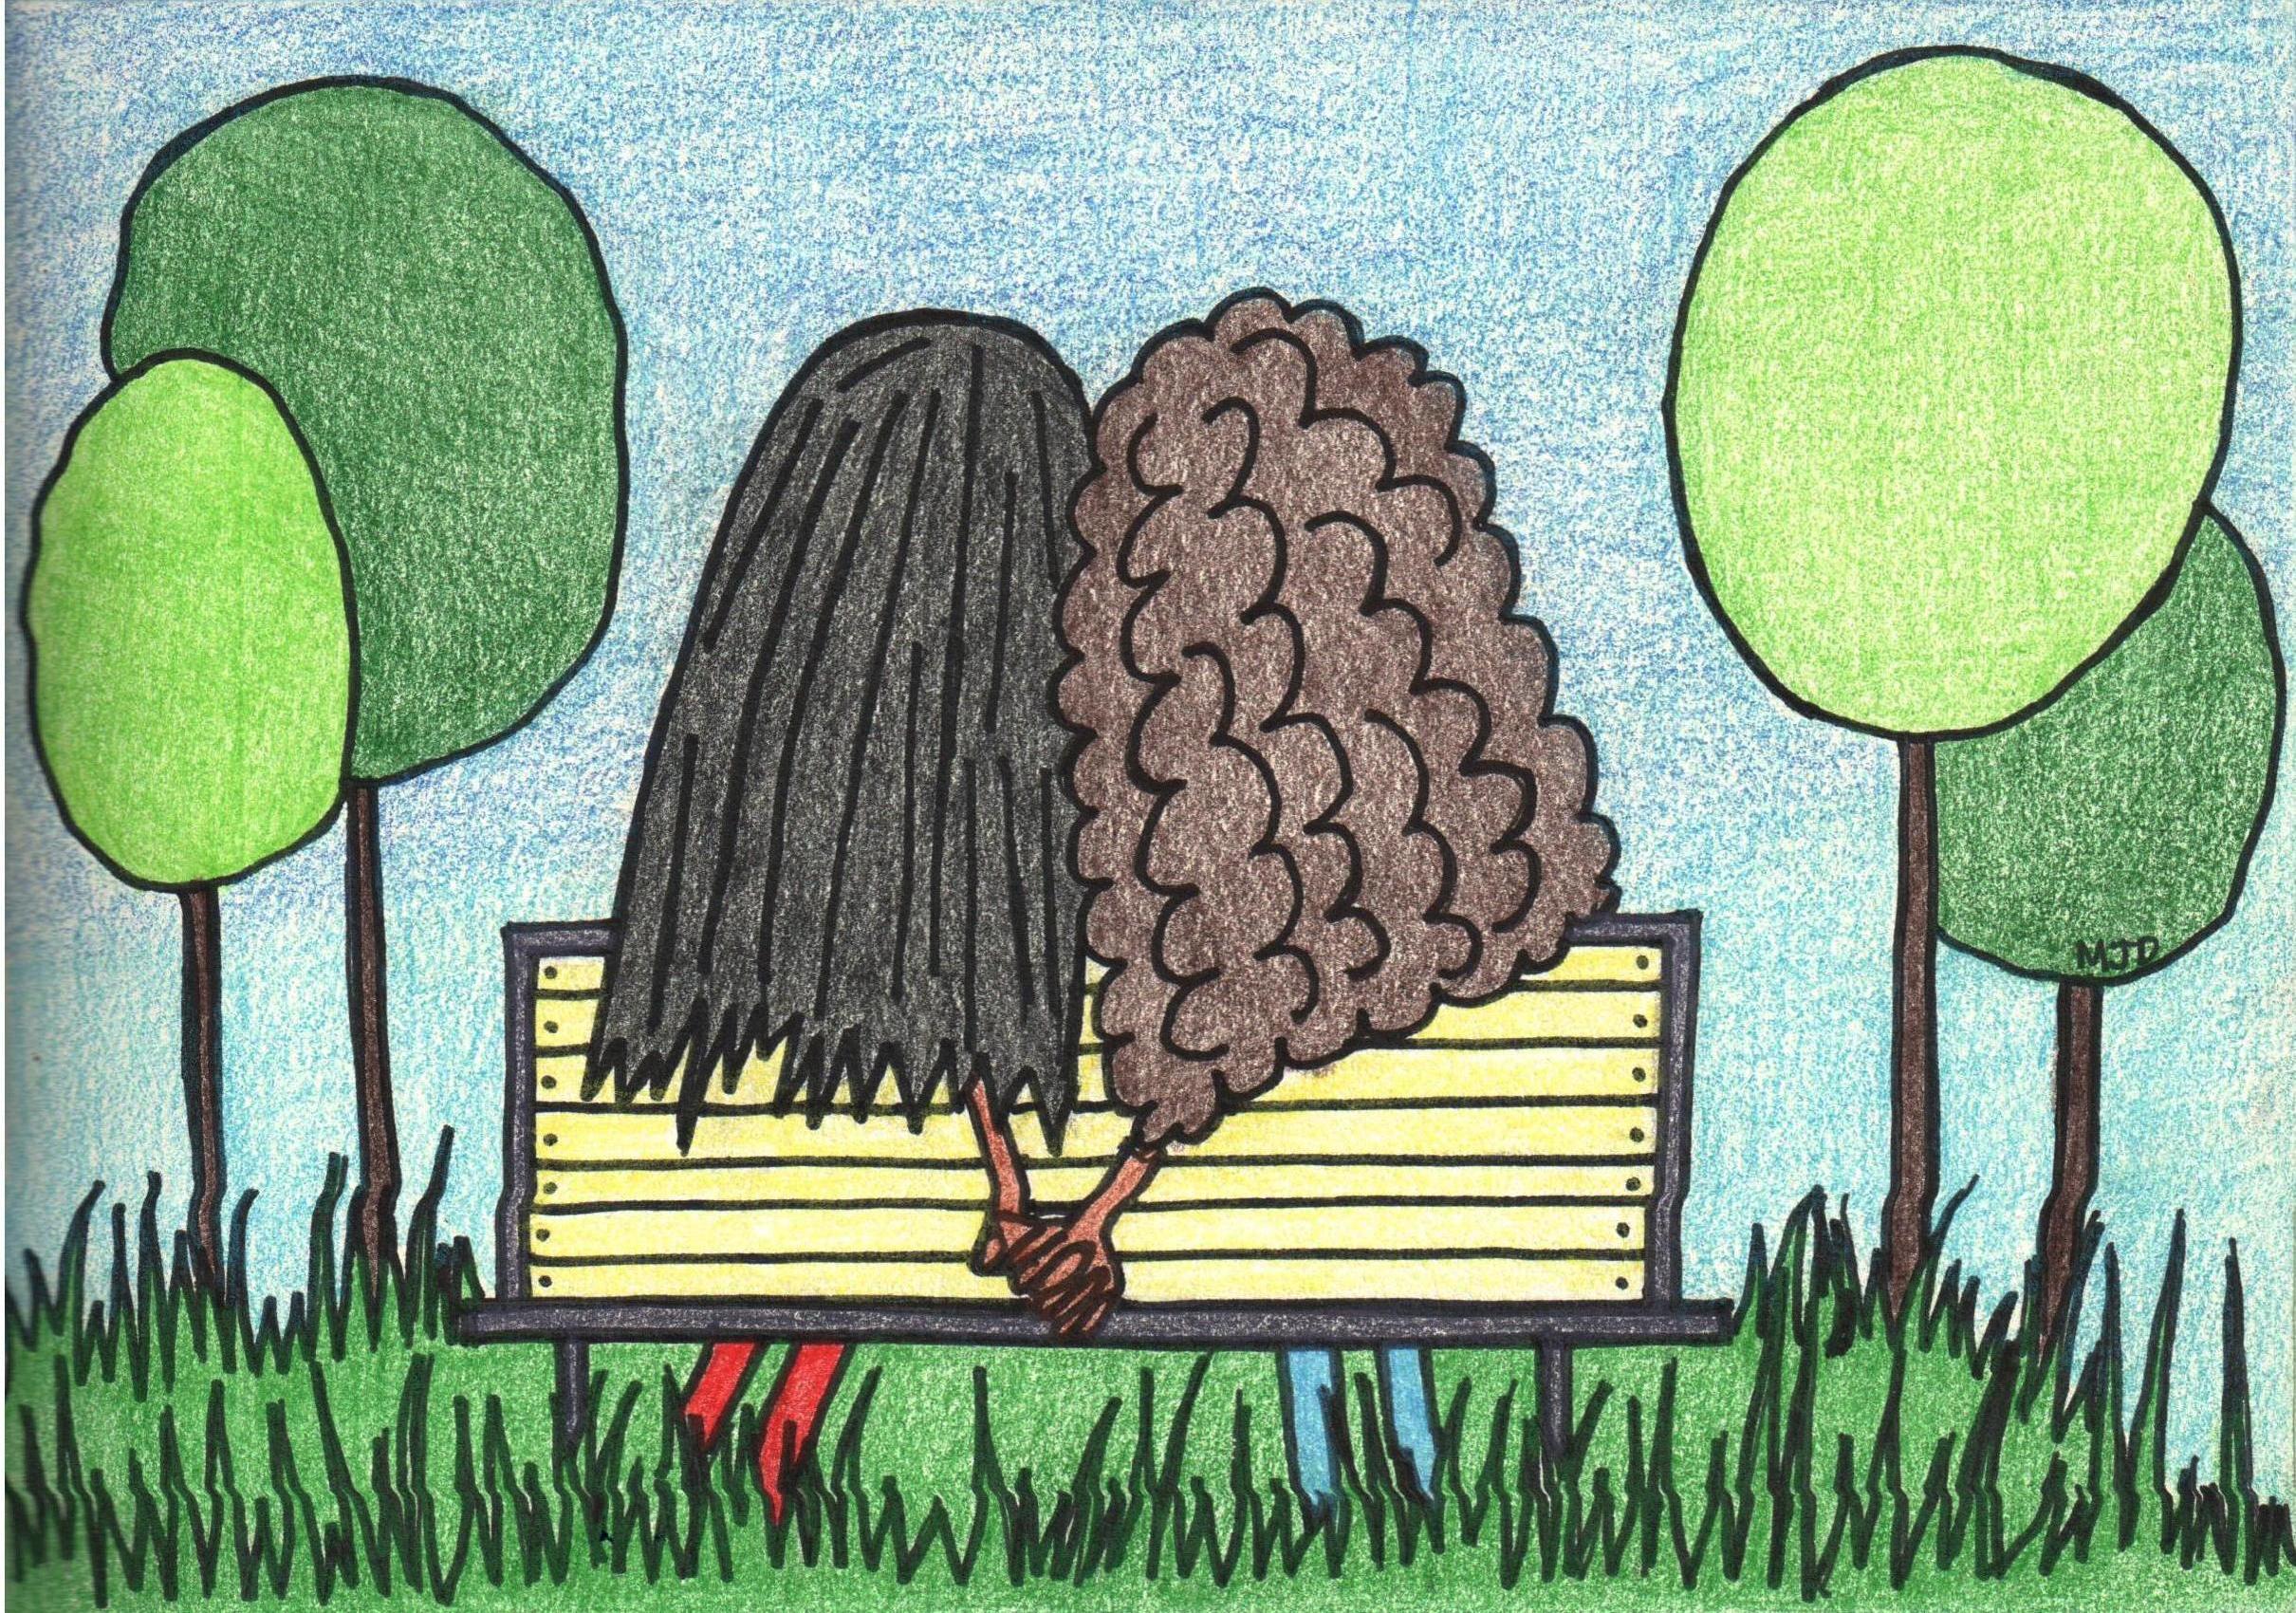 Illustration : The Park Bench Test